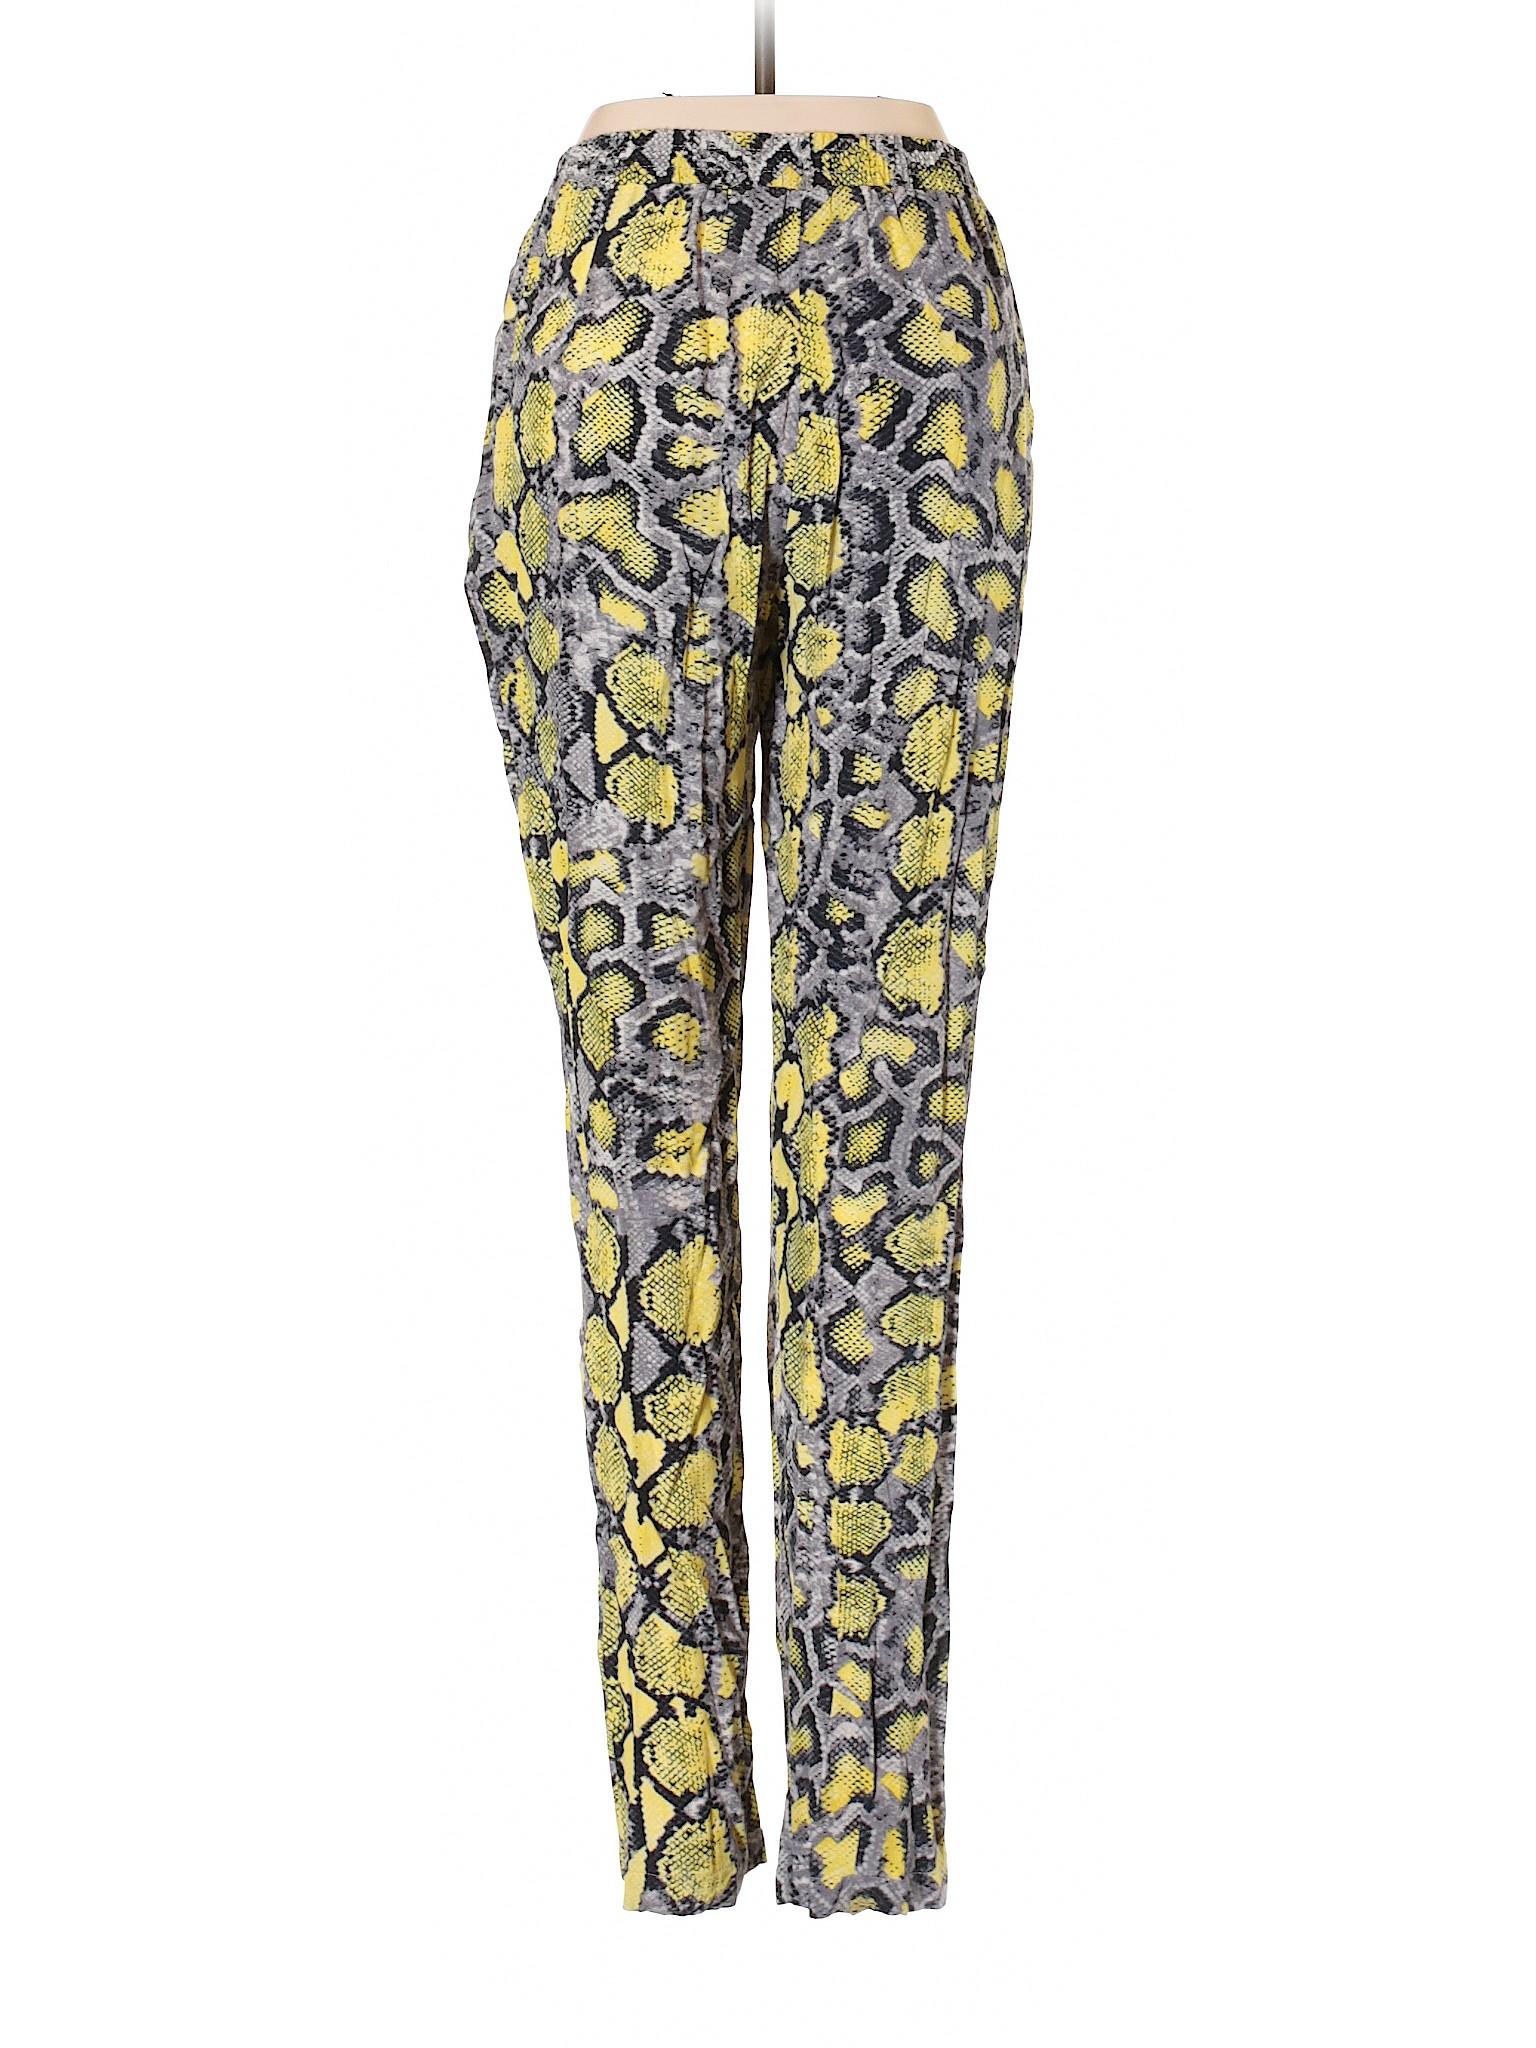 leisure WAYF leisure WAYF Casual Casual Boutique Boutique Pants Pants qnHwCxRW